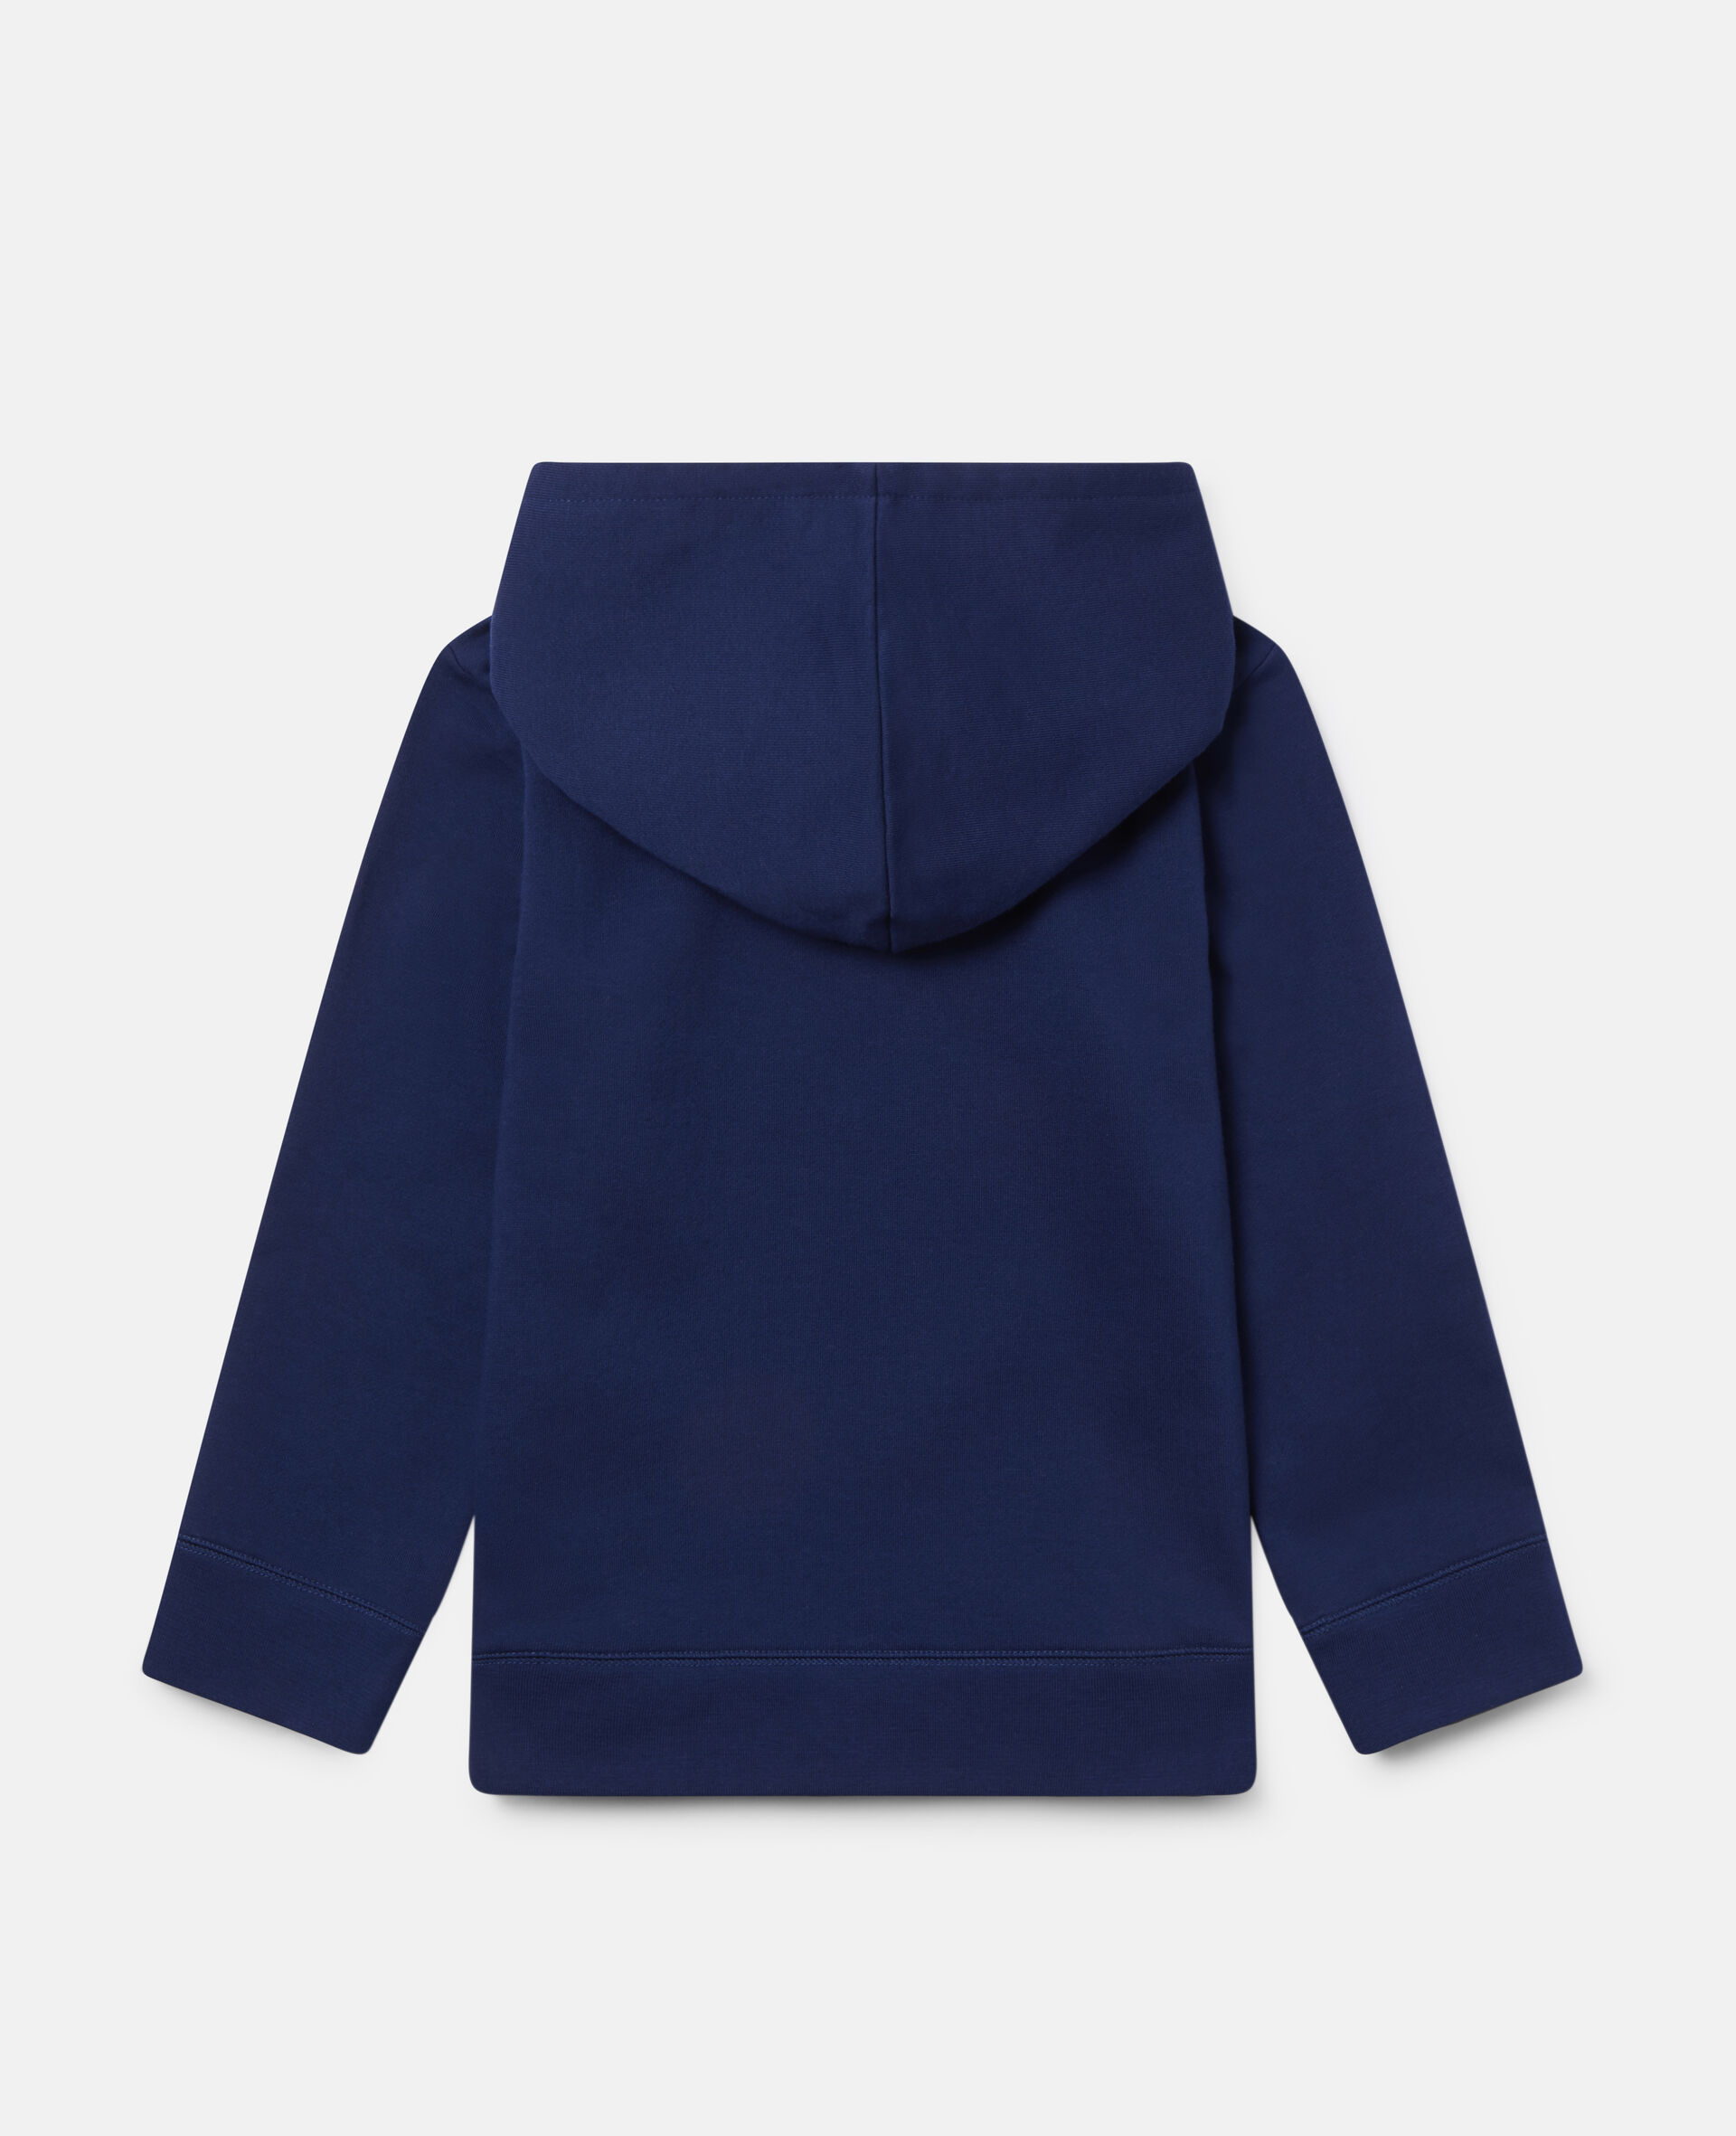 Oversized 'Eat My Dust' Fleece Hoodie-Blue-large image number 3